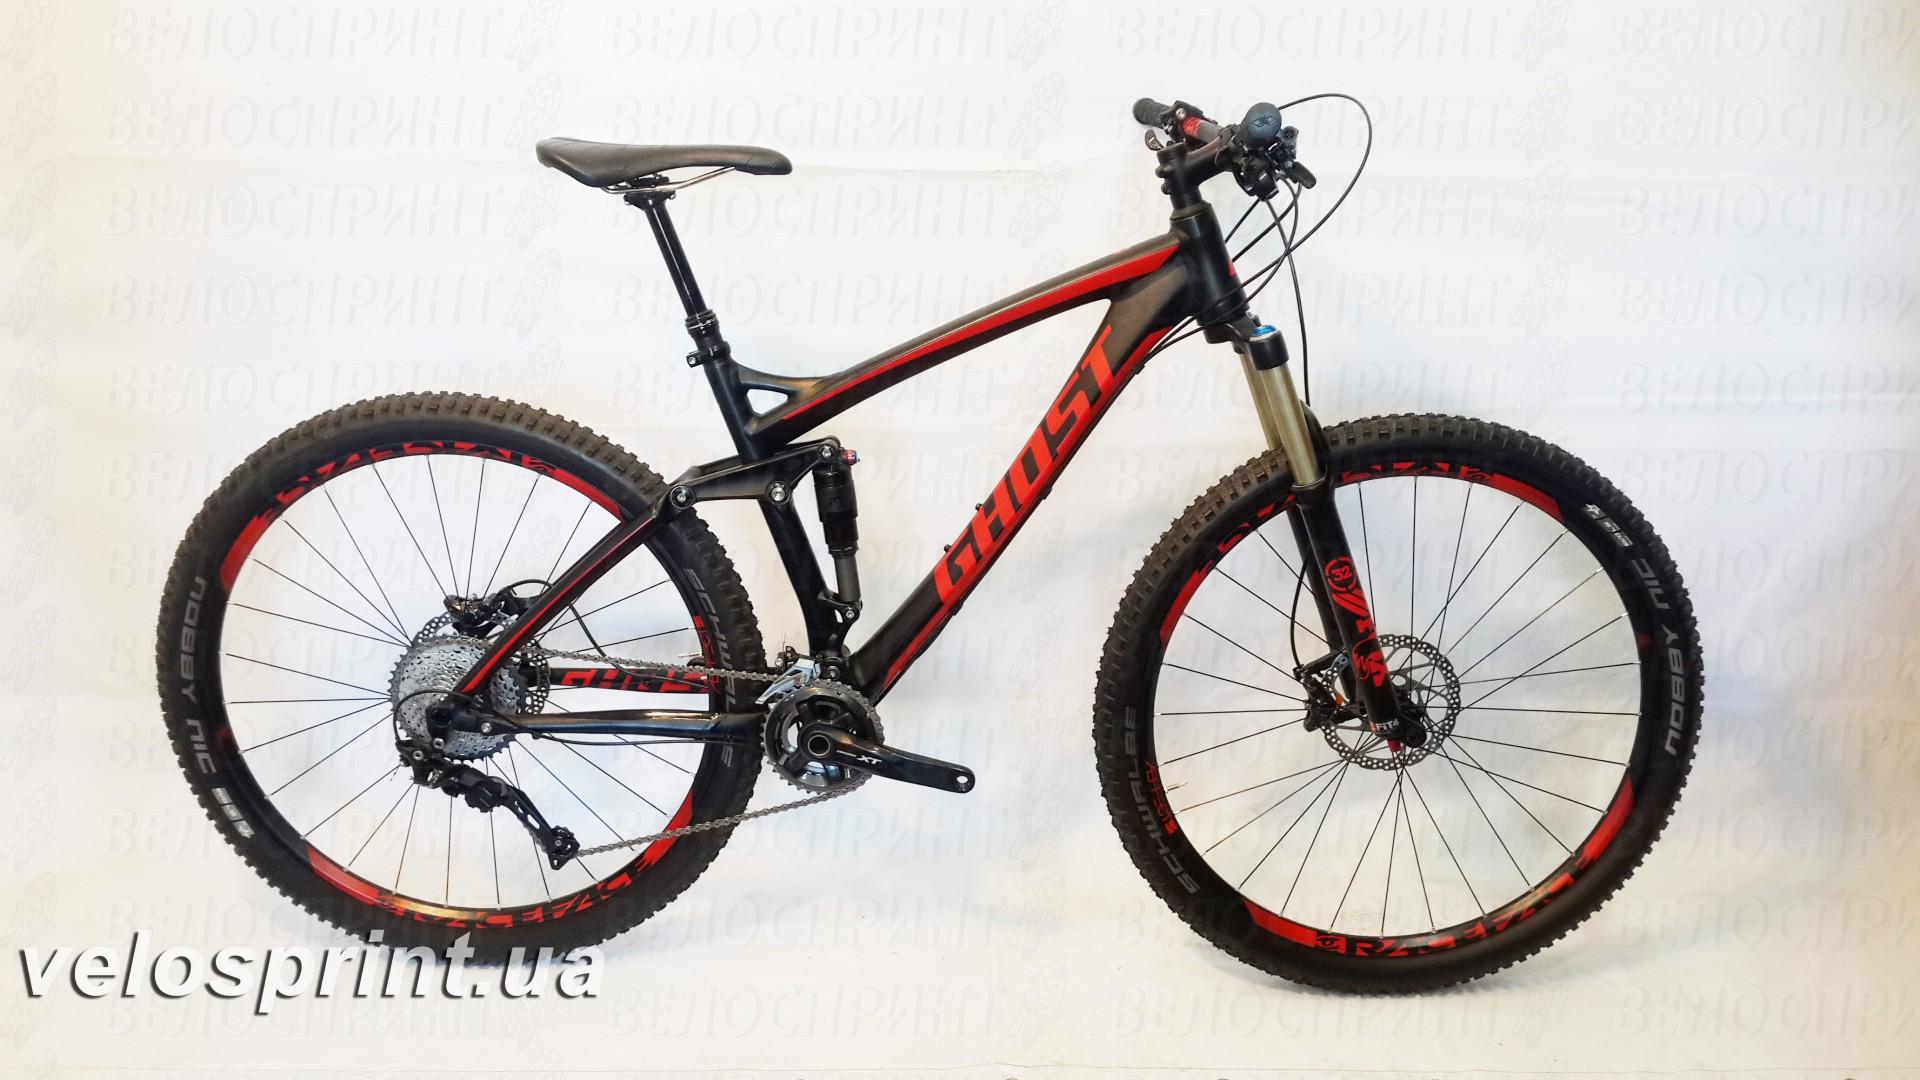 Велосипед GHOST AMR 6 black/red общий вид год 2016